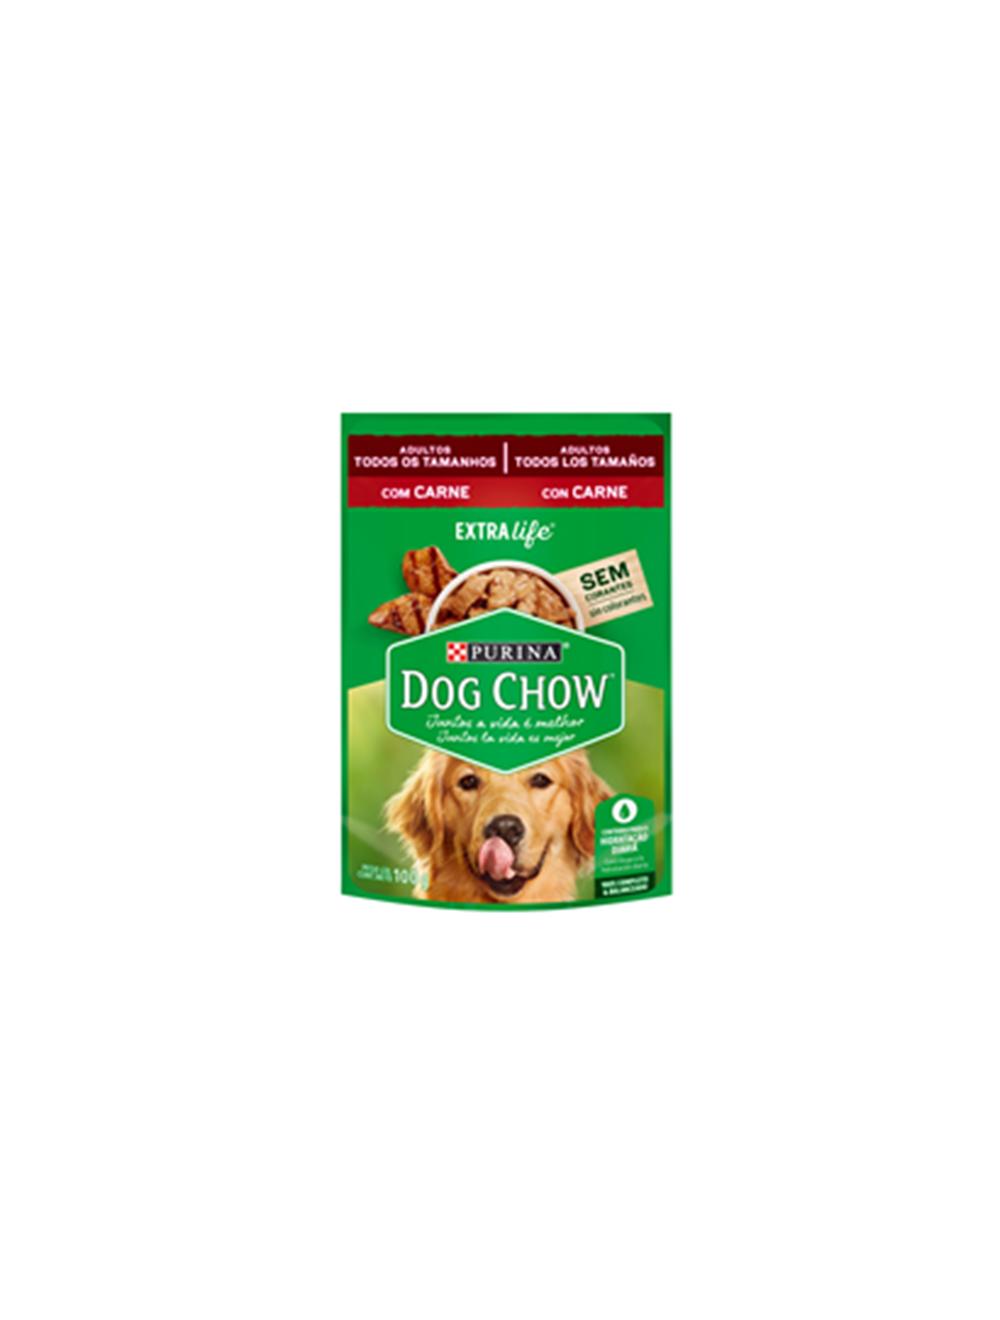 Comida Purina dog chow todos los tamaños - Ciudaddemascotas.com